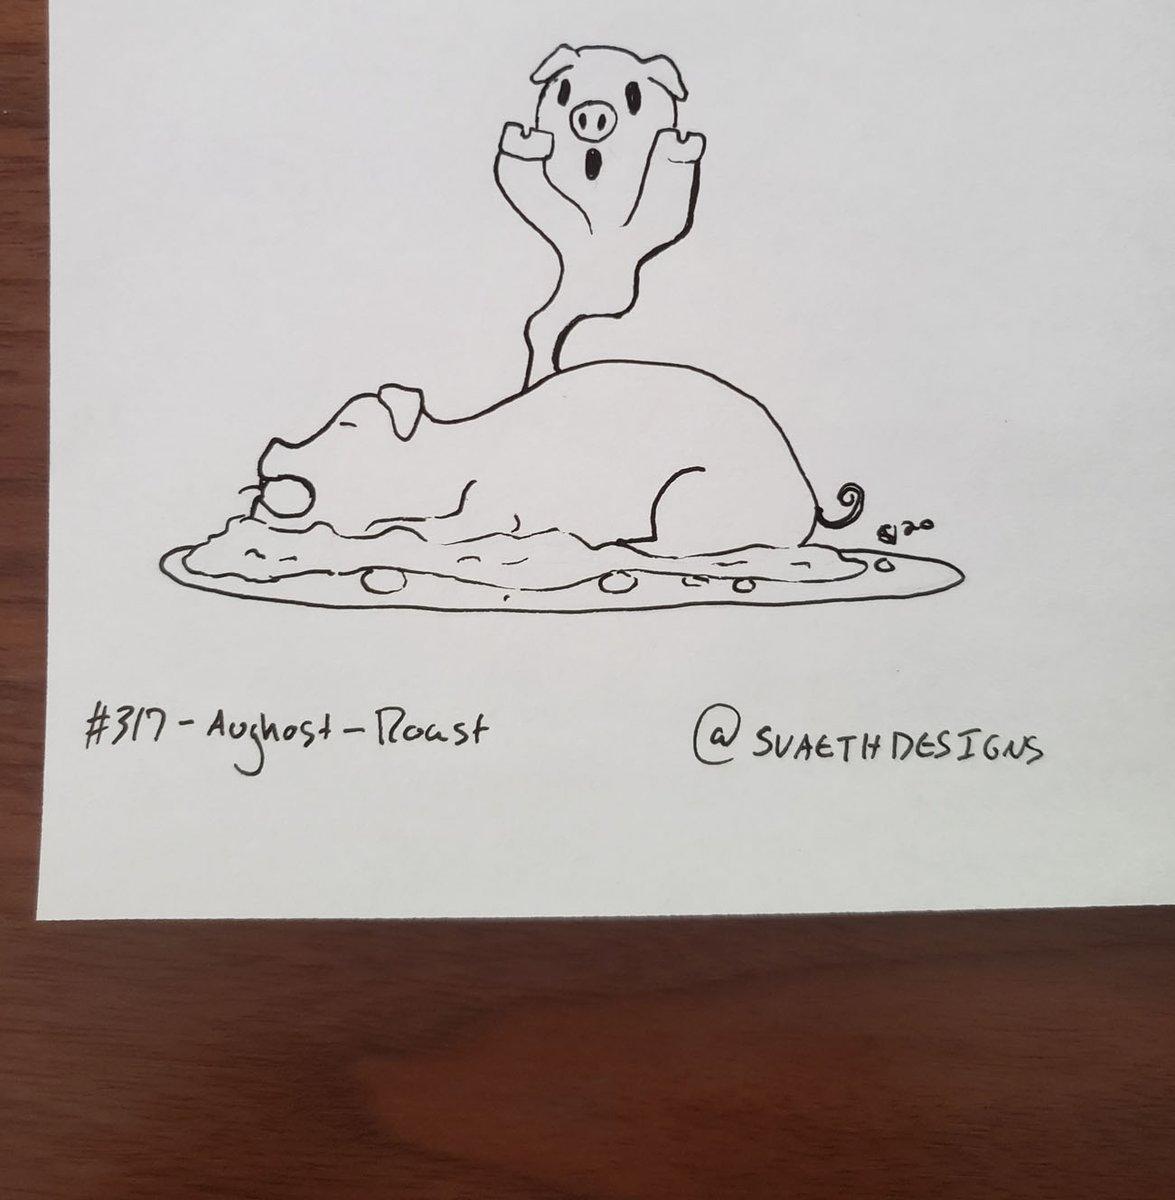 Sketch Daily - 317 - Aughost - Roast    #sketchdaily #roast #roastpig #pig #feast #food #dinner #ghost #spirit #aughost #Aughost2020 #artprompts #artwork #pen #ink #drawing #illustration  #doodle #dailyart https://t.co/usOHEJhSaX